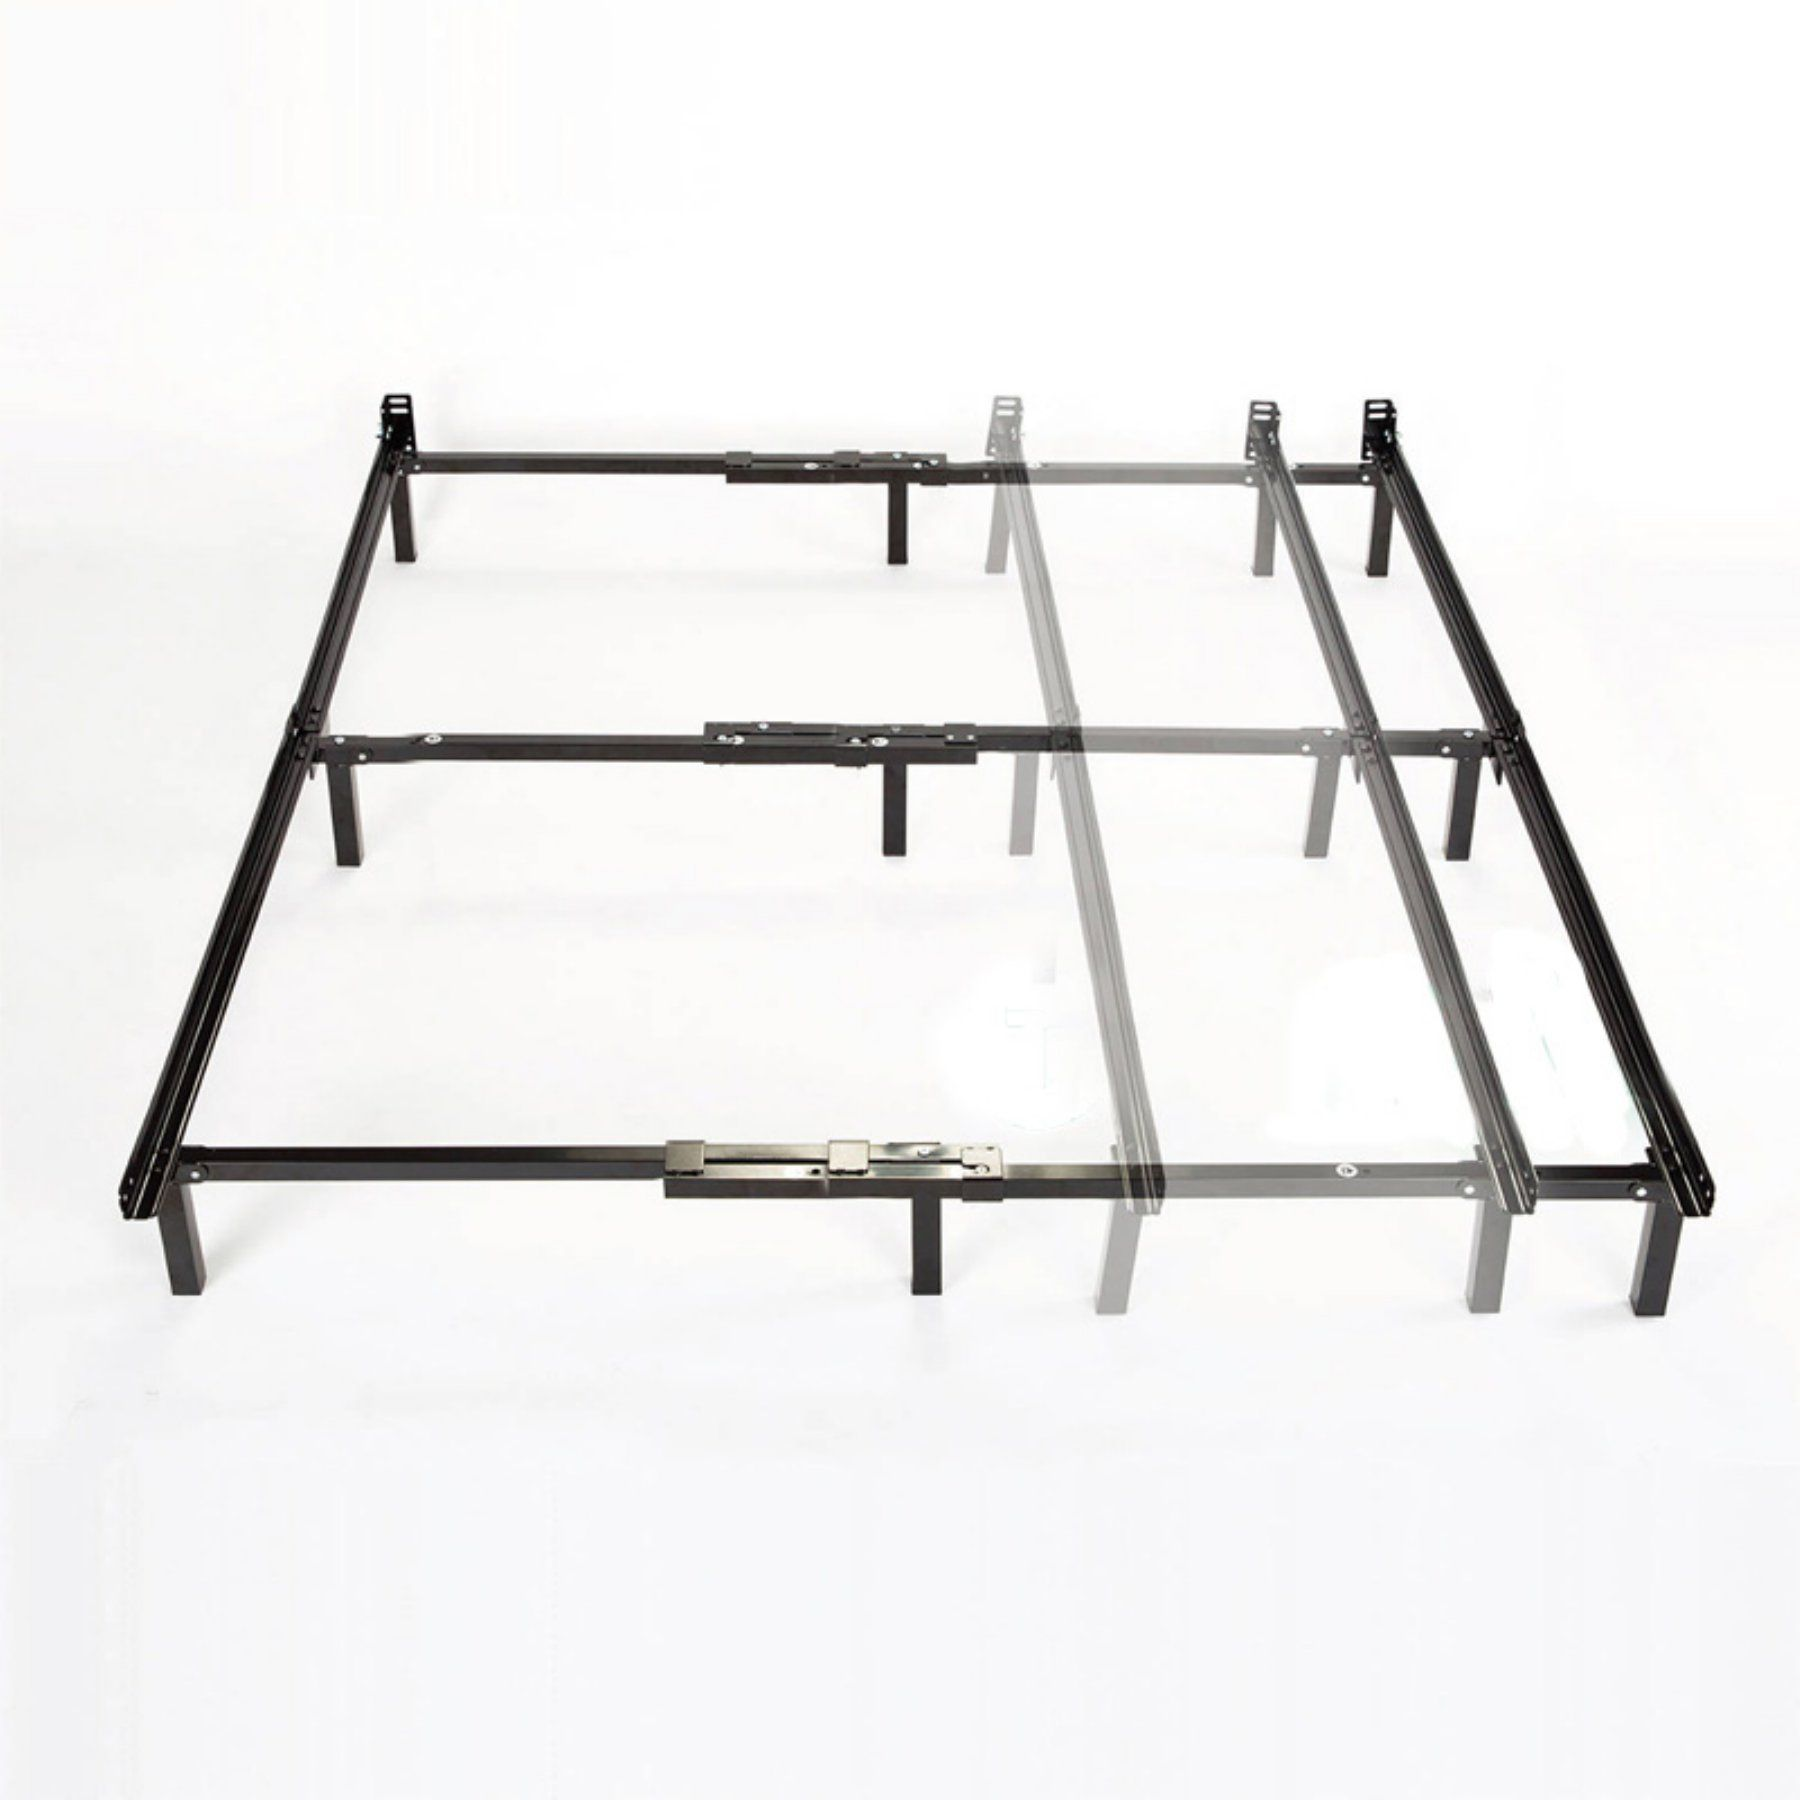 Spa Sensations 7 In Low Profile Adjustable Steel Bed Frame